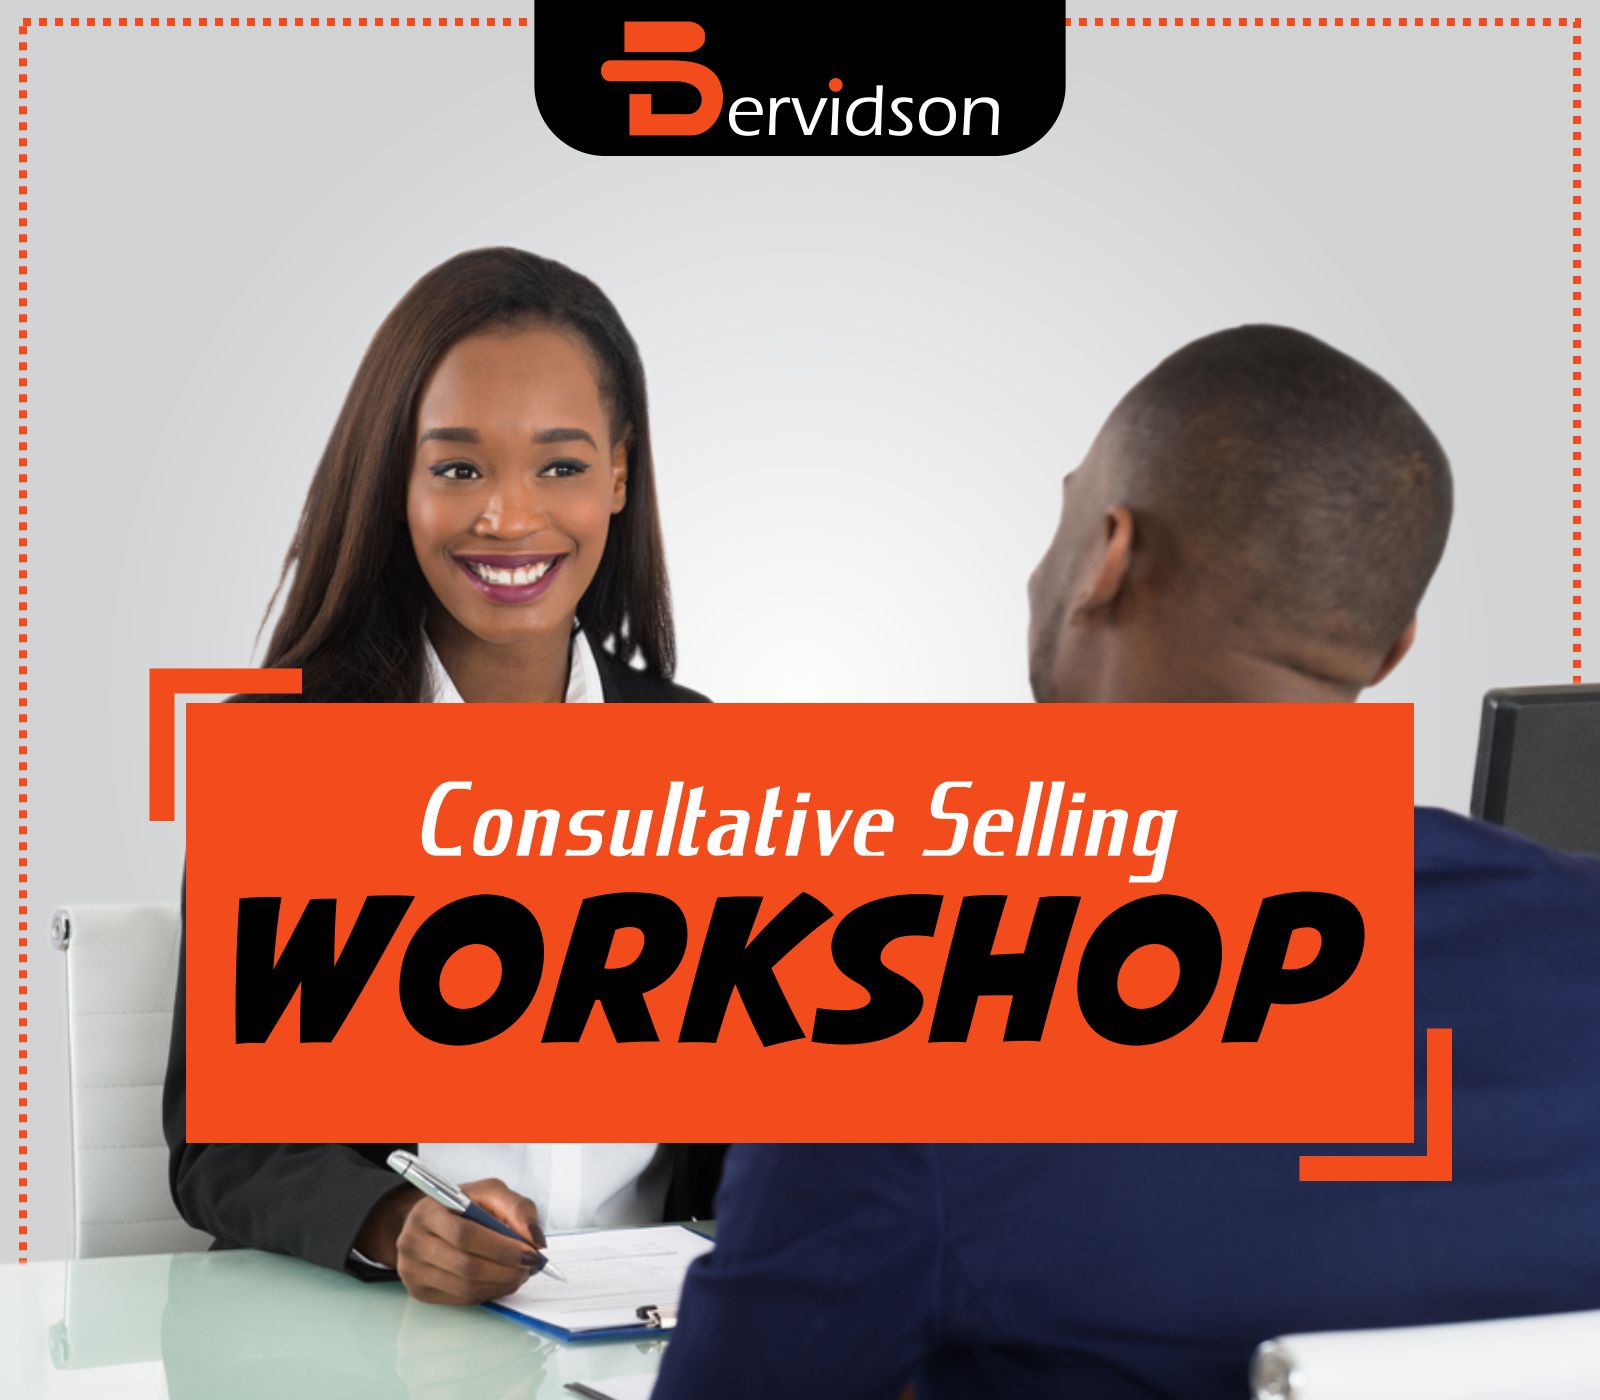 Consultative Selling Skills Workshop